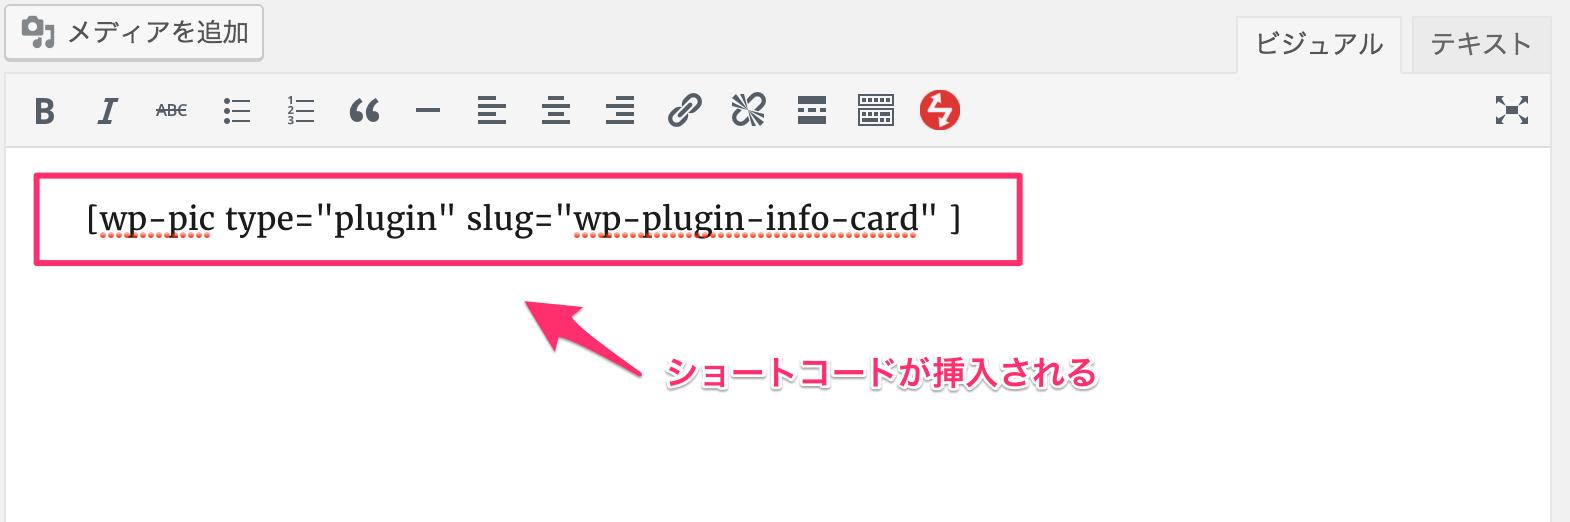 plugincard_set3